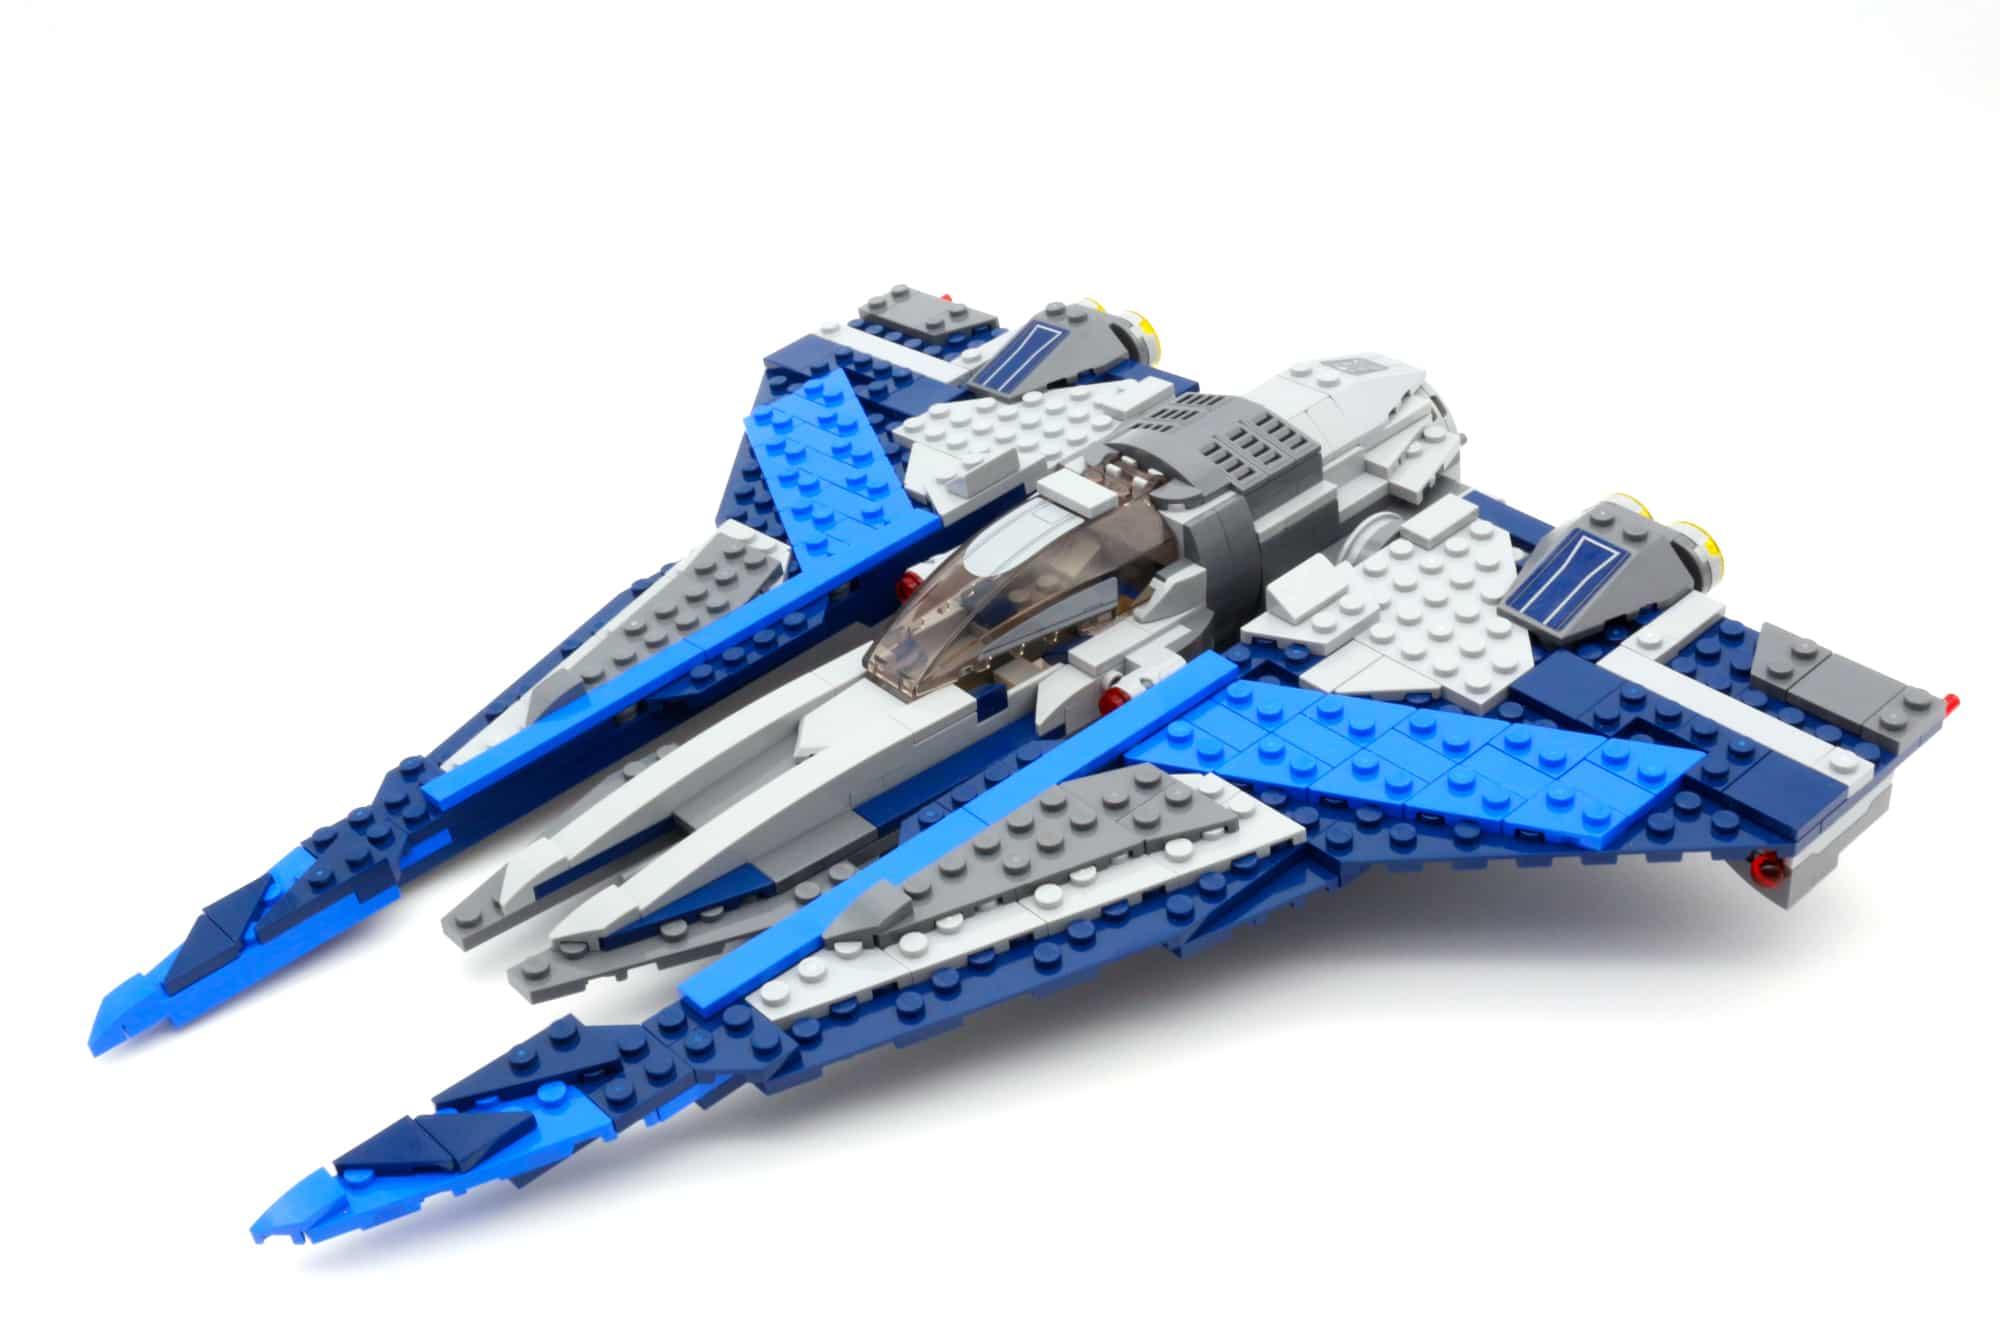 LEGO Star Wars 75316 Mandalorian Starfighter 30